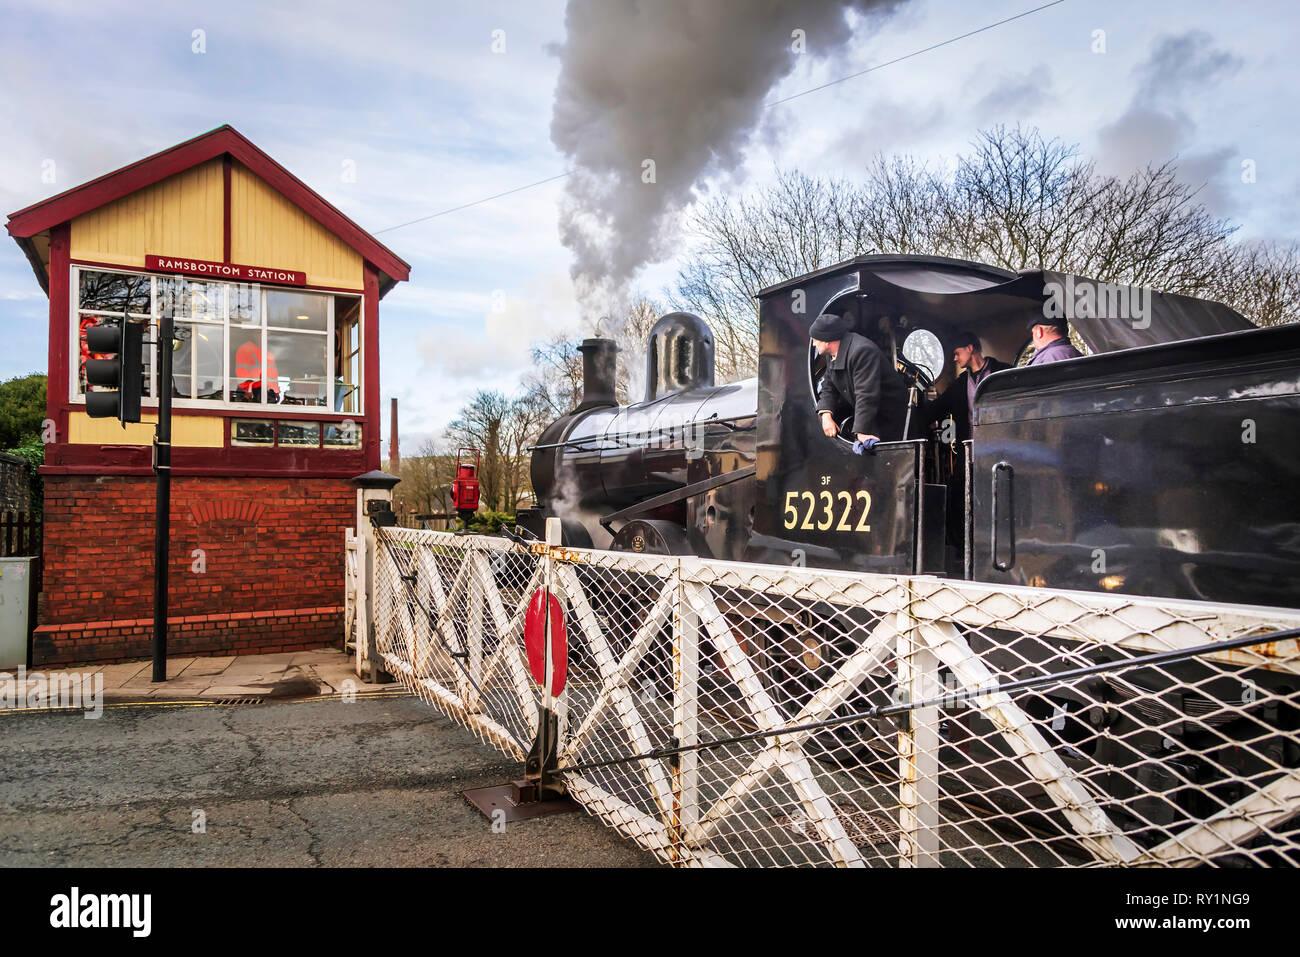 Esat Lancashire railway Spring steam gala 2019. Stock Photo